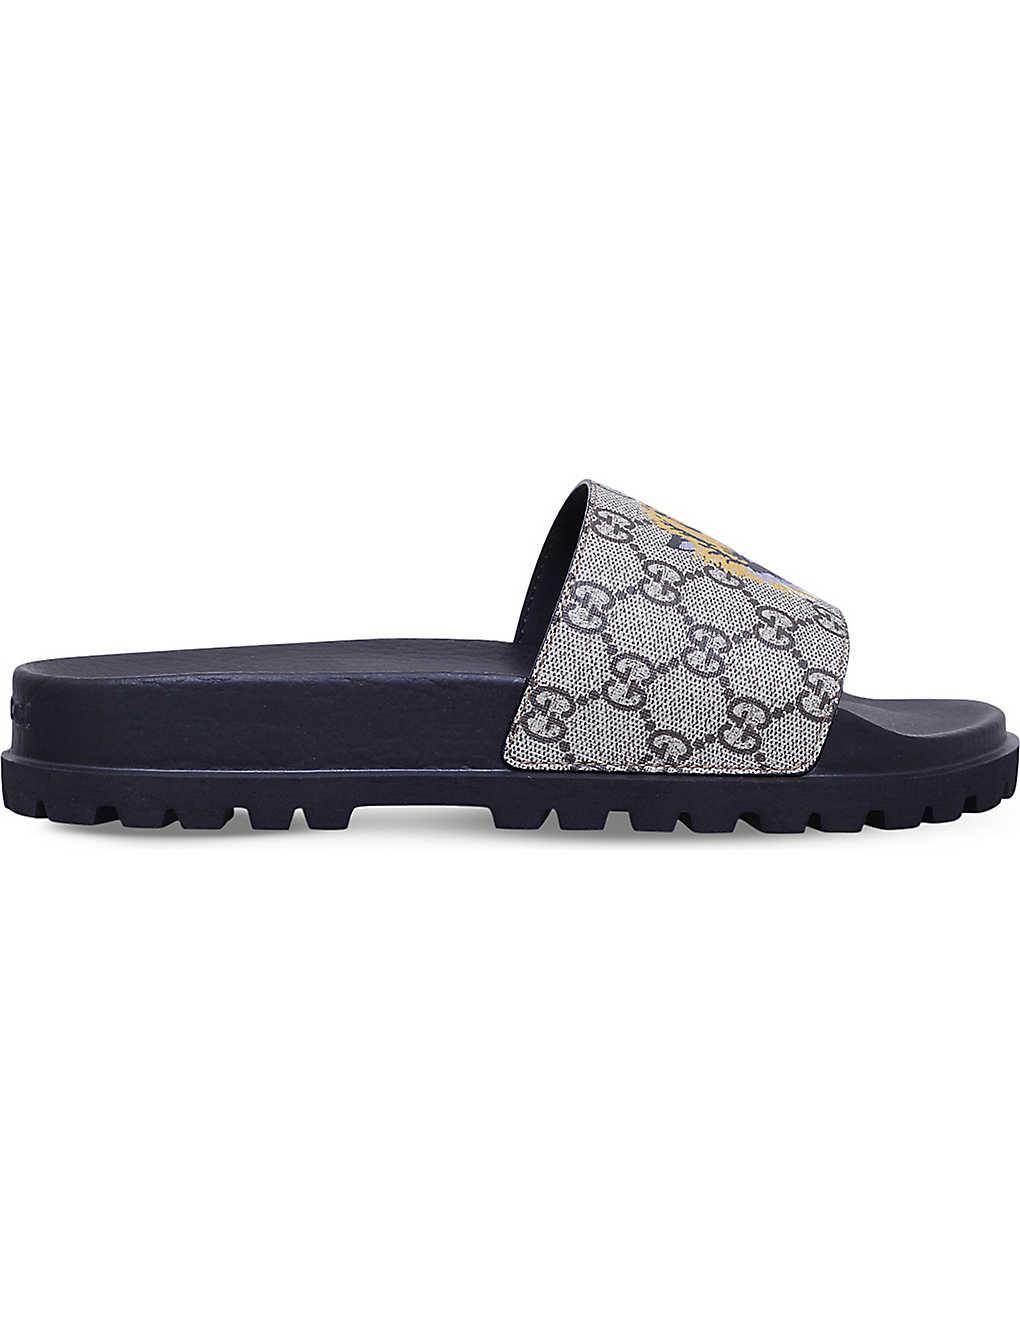 d5668878d7b4 GUCCI - Pursuit tiger-print canvas slider sandals